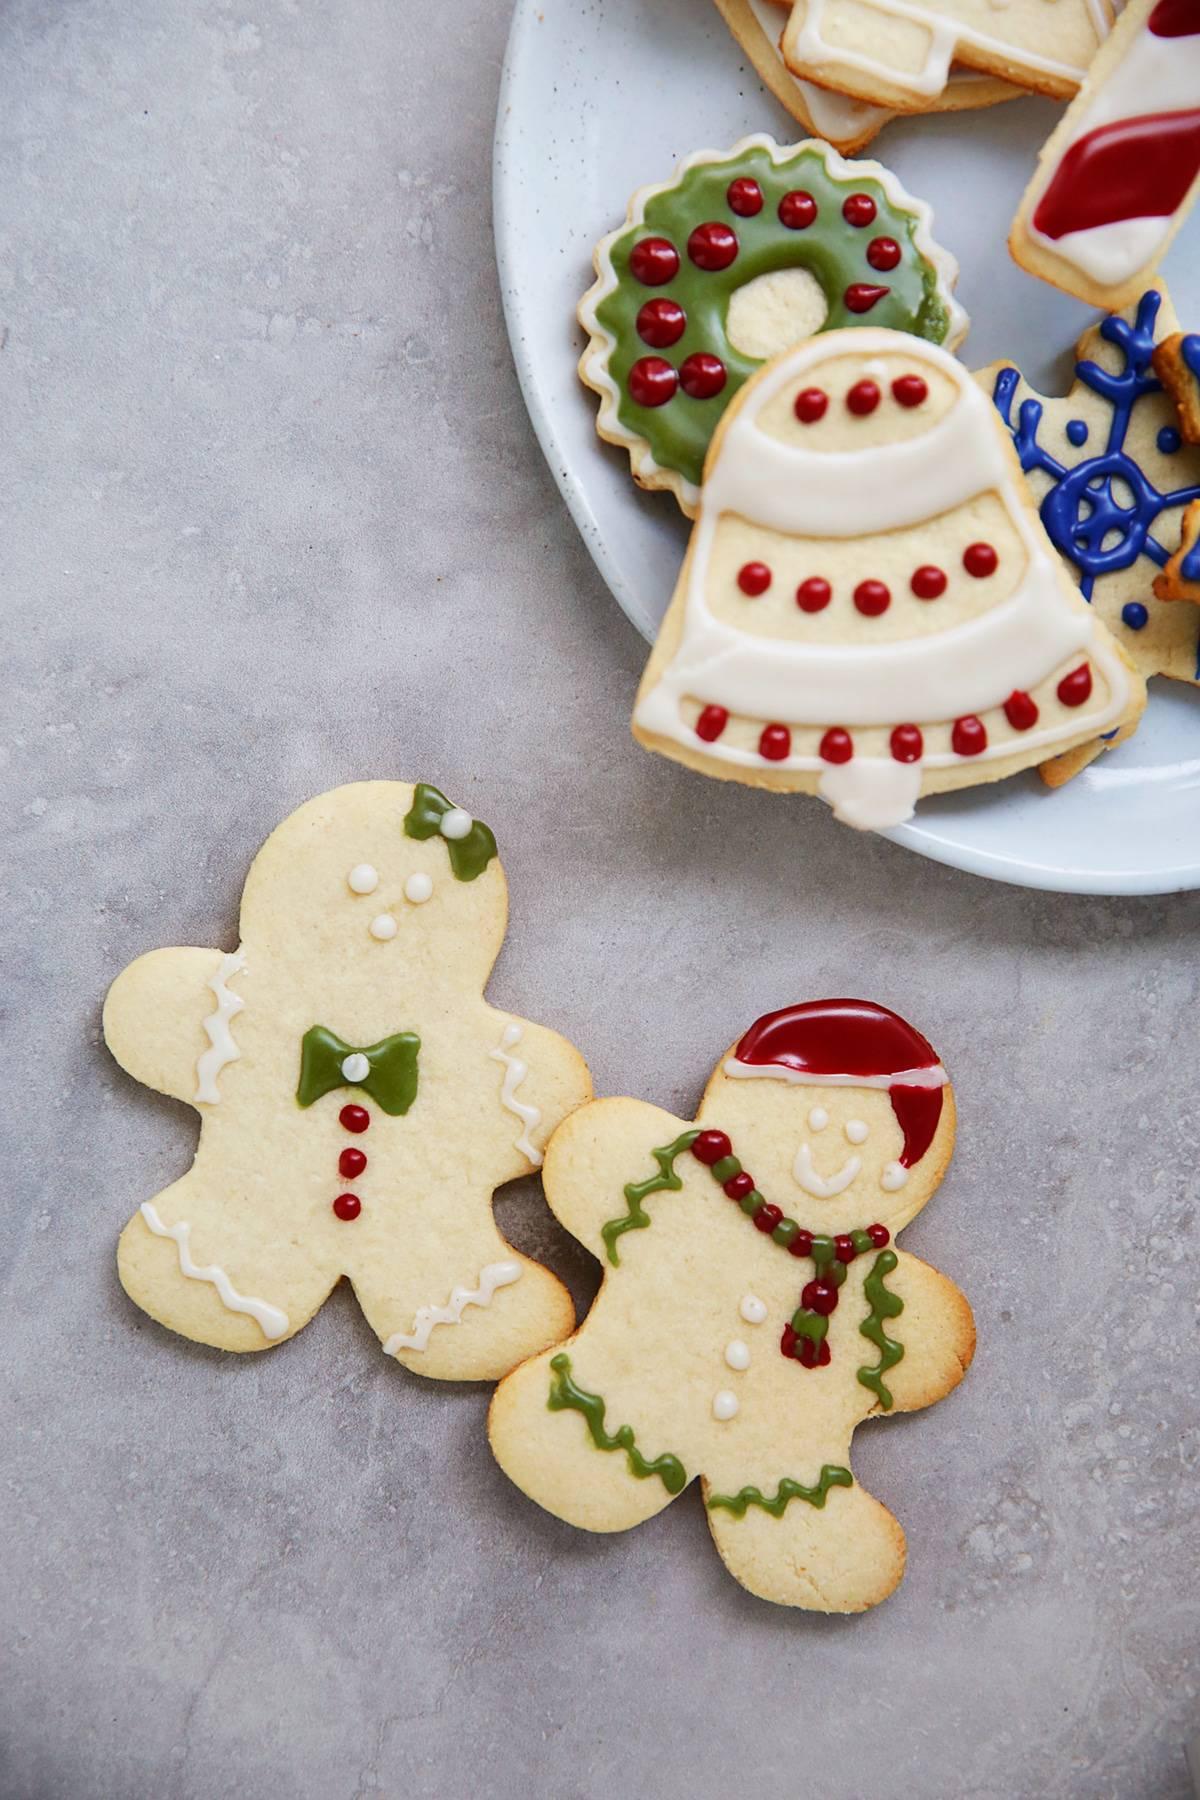 How do I make gluten free cookies